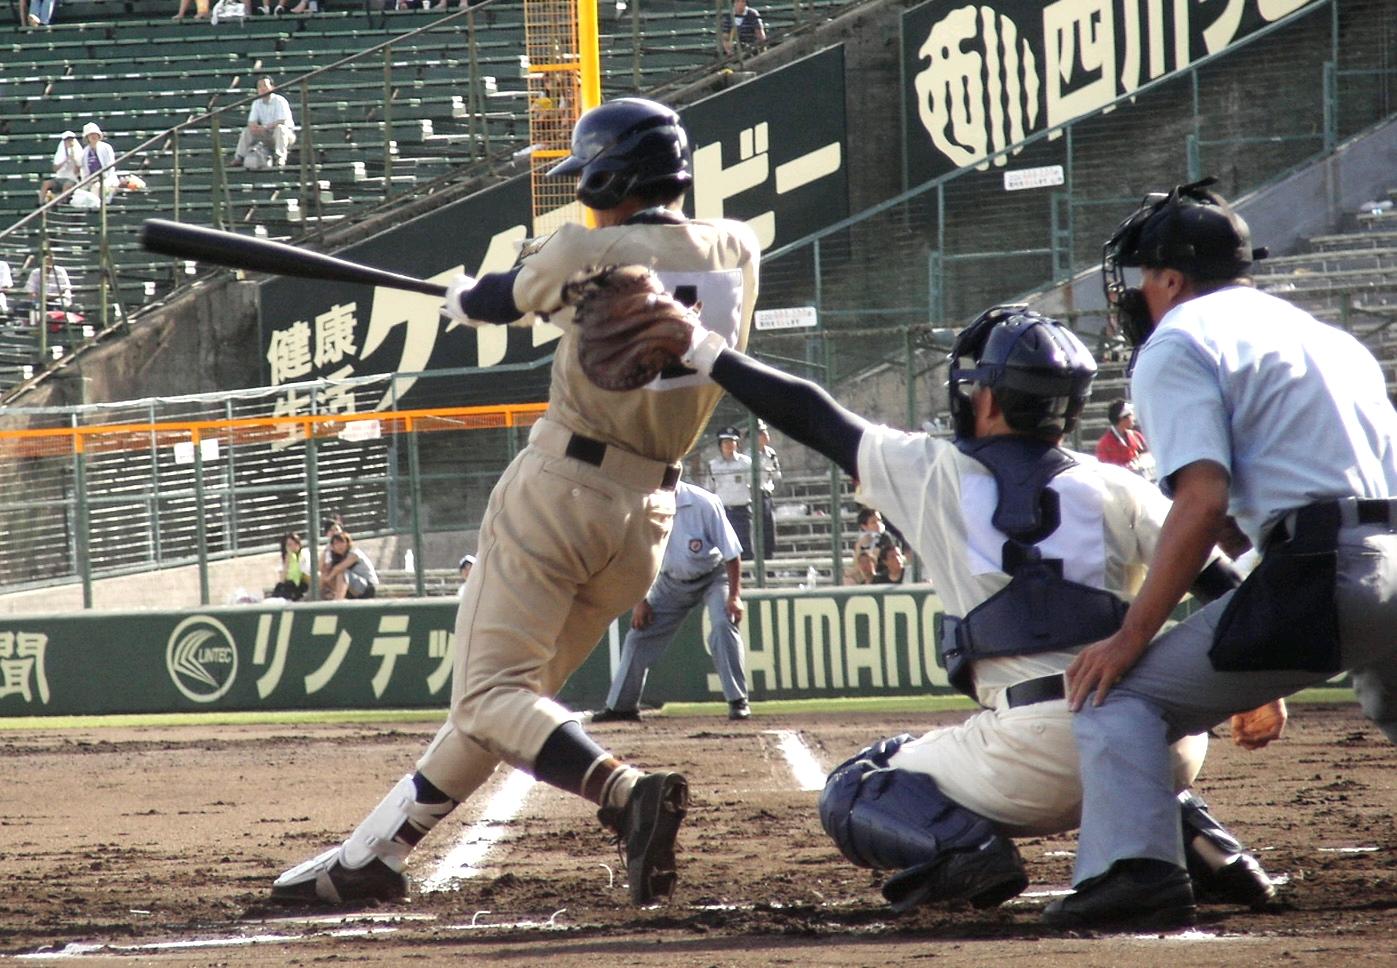 Batting_High_school_baseball_in_Japan_2007.jpg